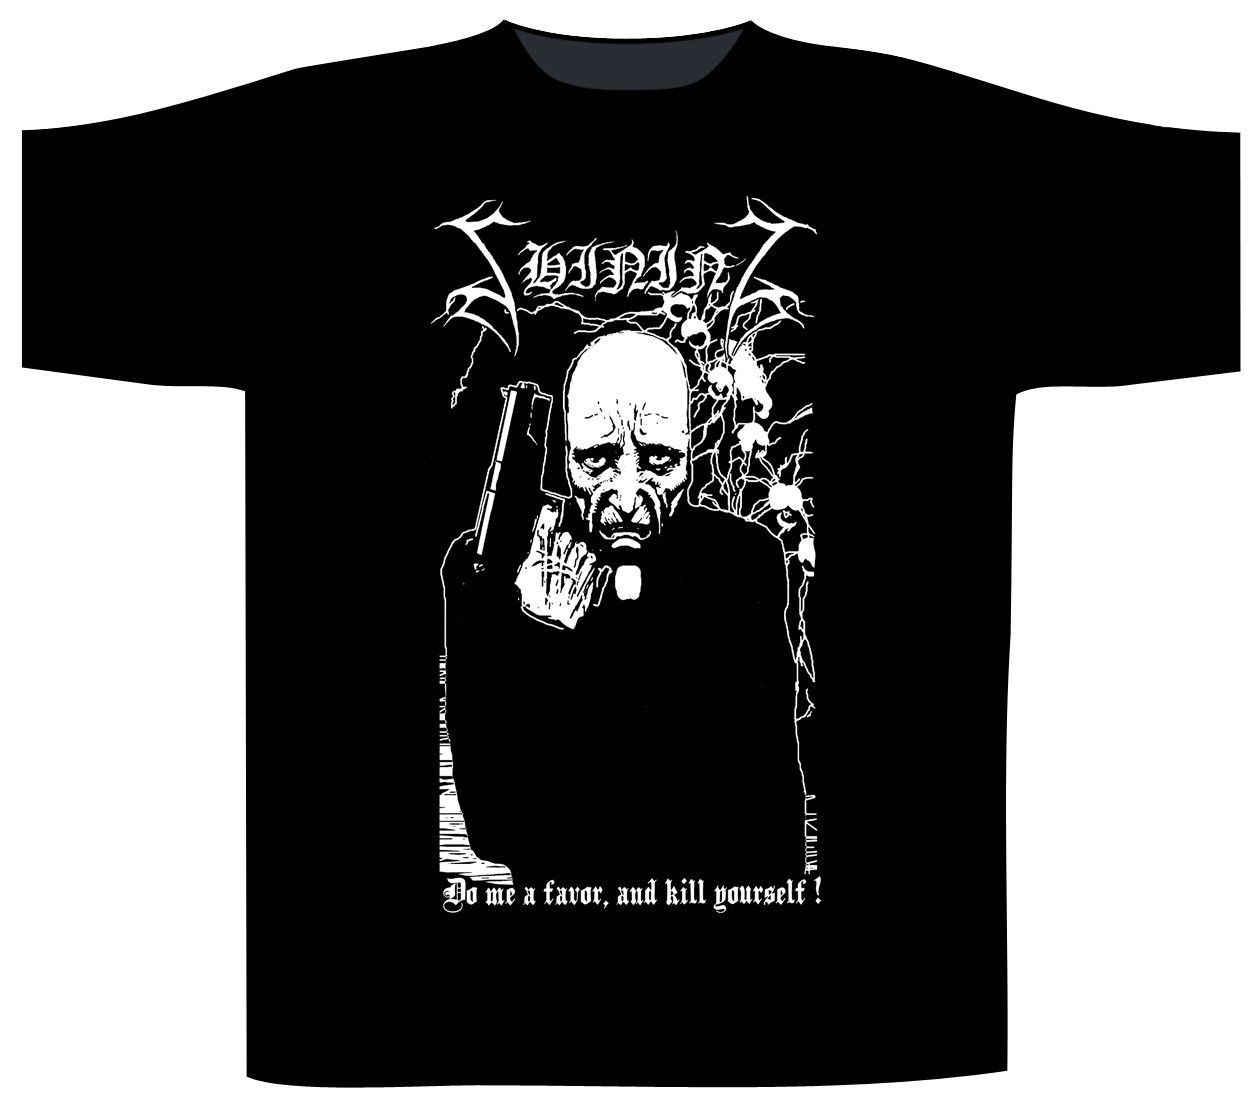 Shining Do Me A Favor Shirt S 3XL Official Tshirt Black Metal Band T Shirt Men Tops Short Sleeve Cotton Fitness T Shirts